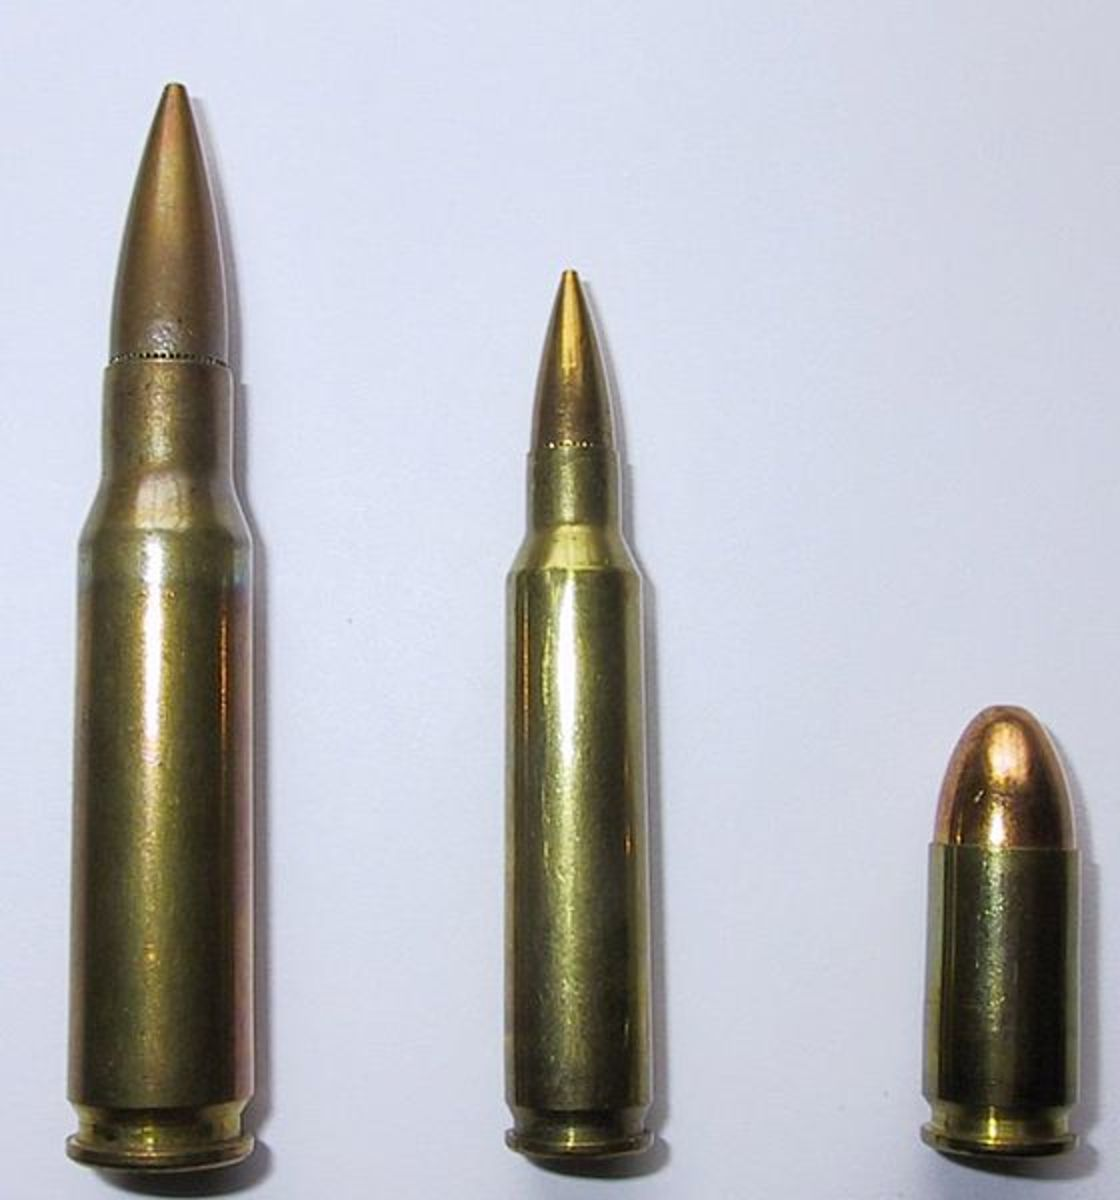 L-R: 7.62x51 NATO, 5.56x45 NATO, 9x19mm